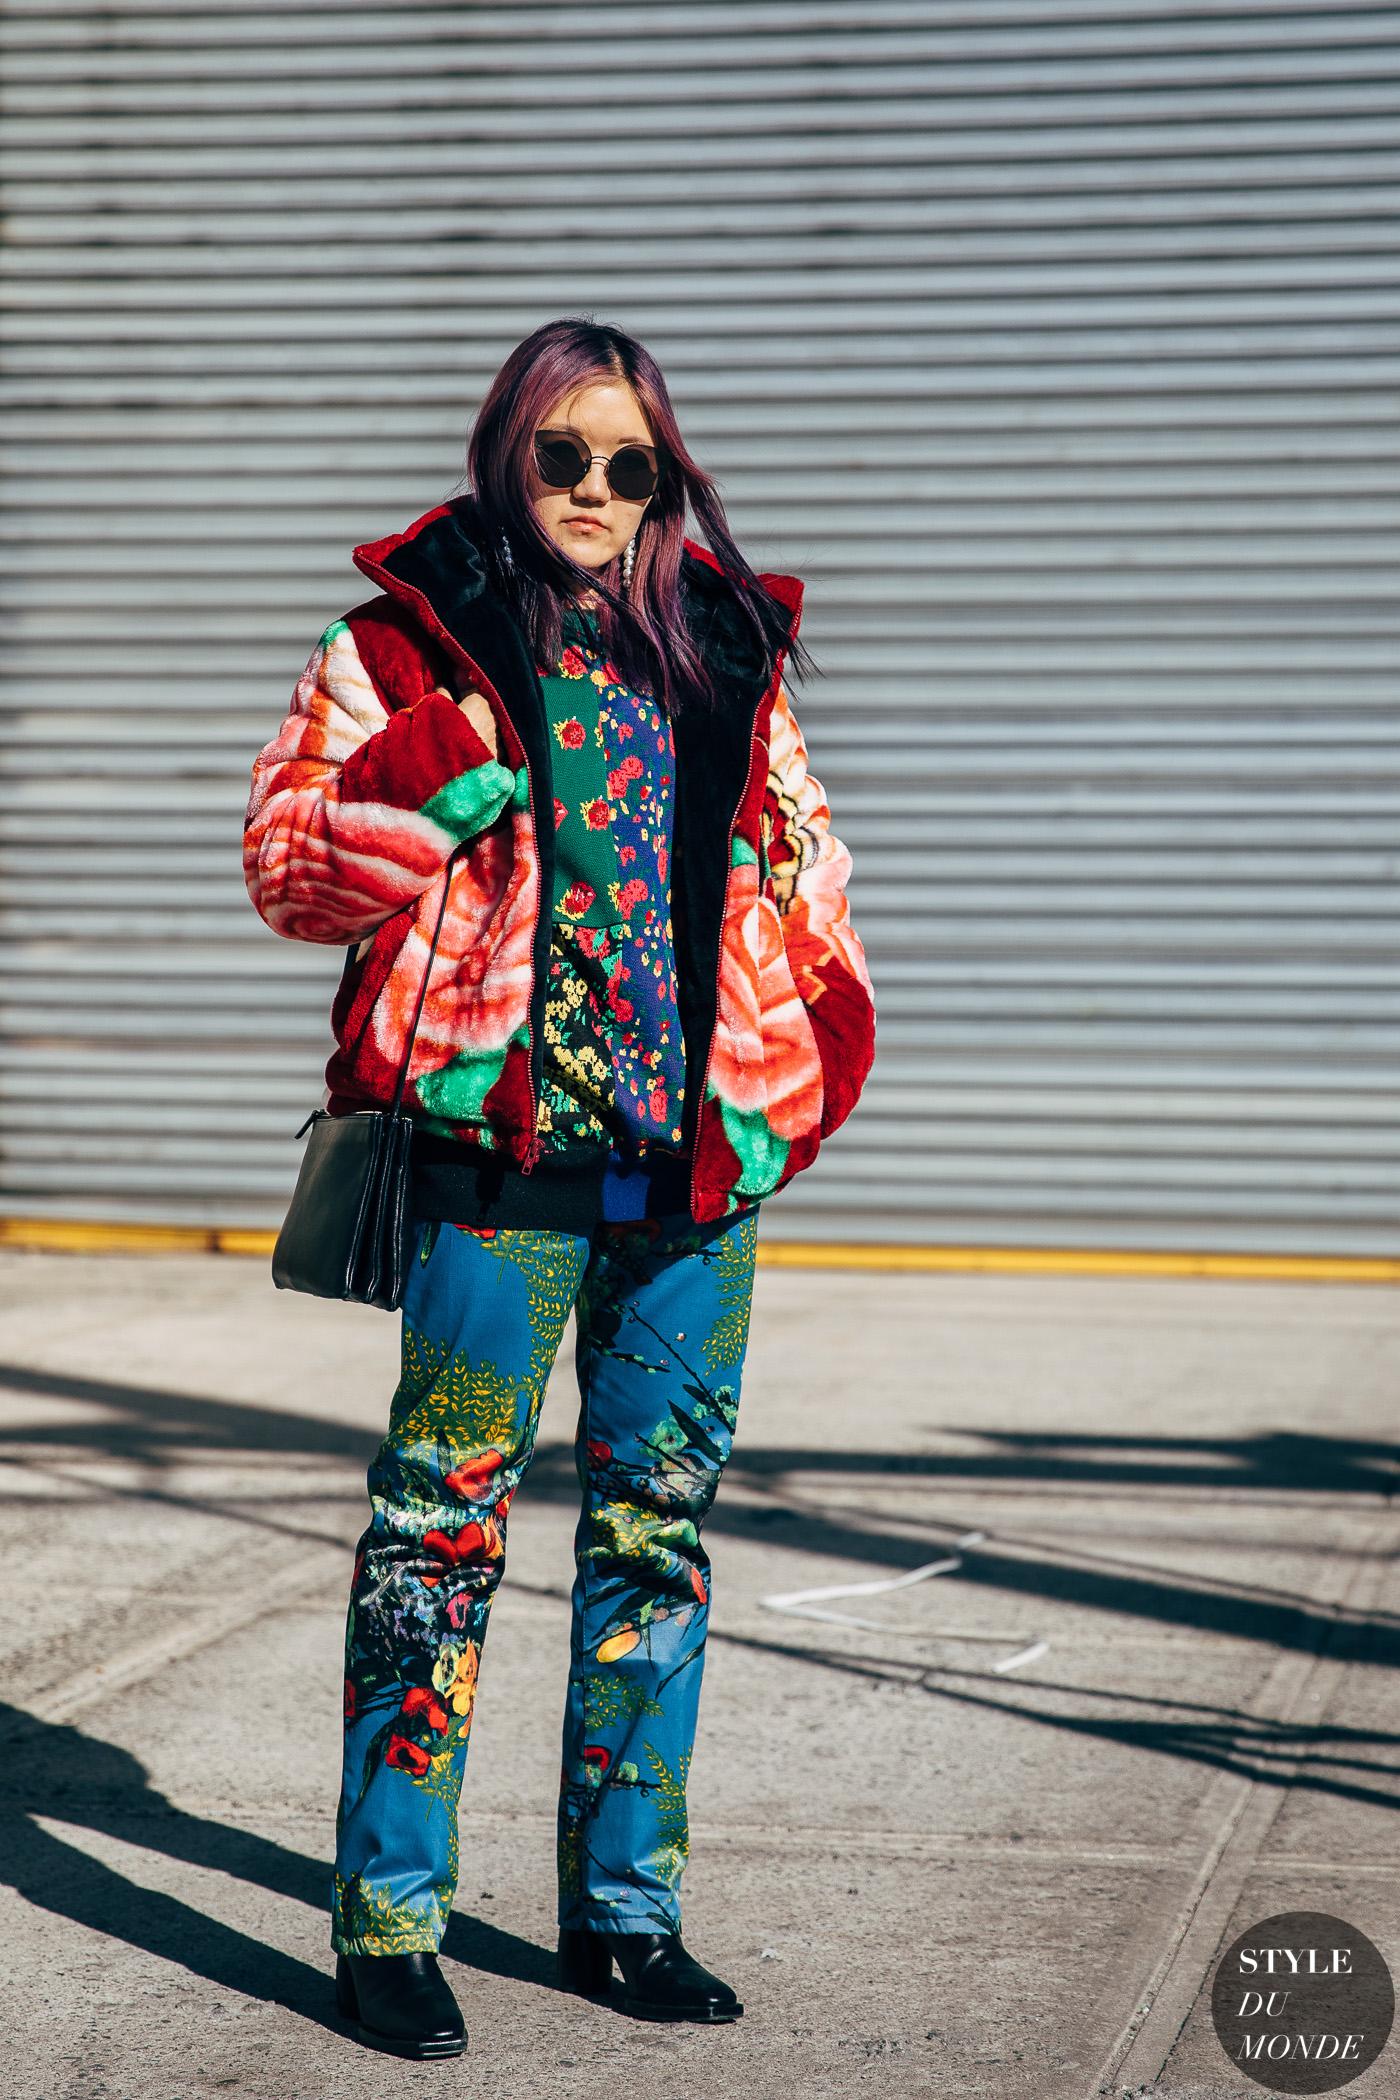 ph: Style du Monde